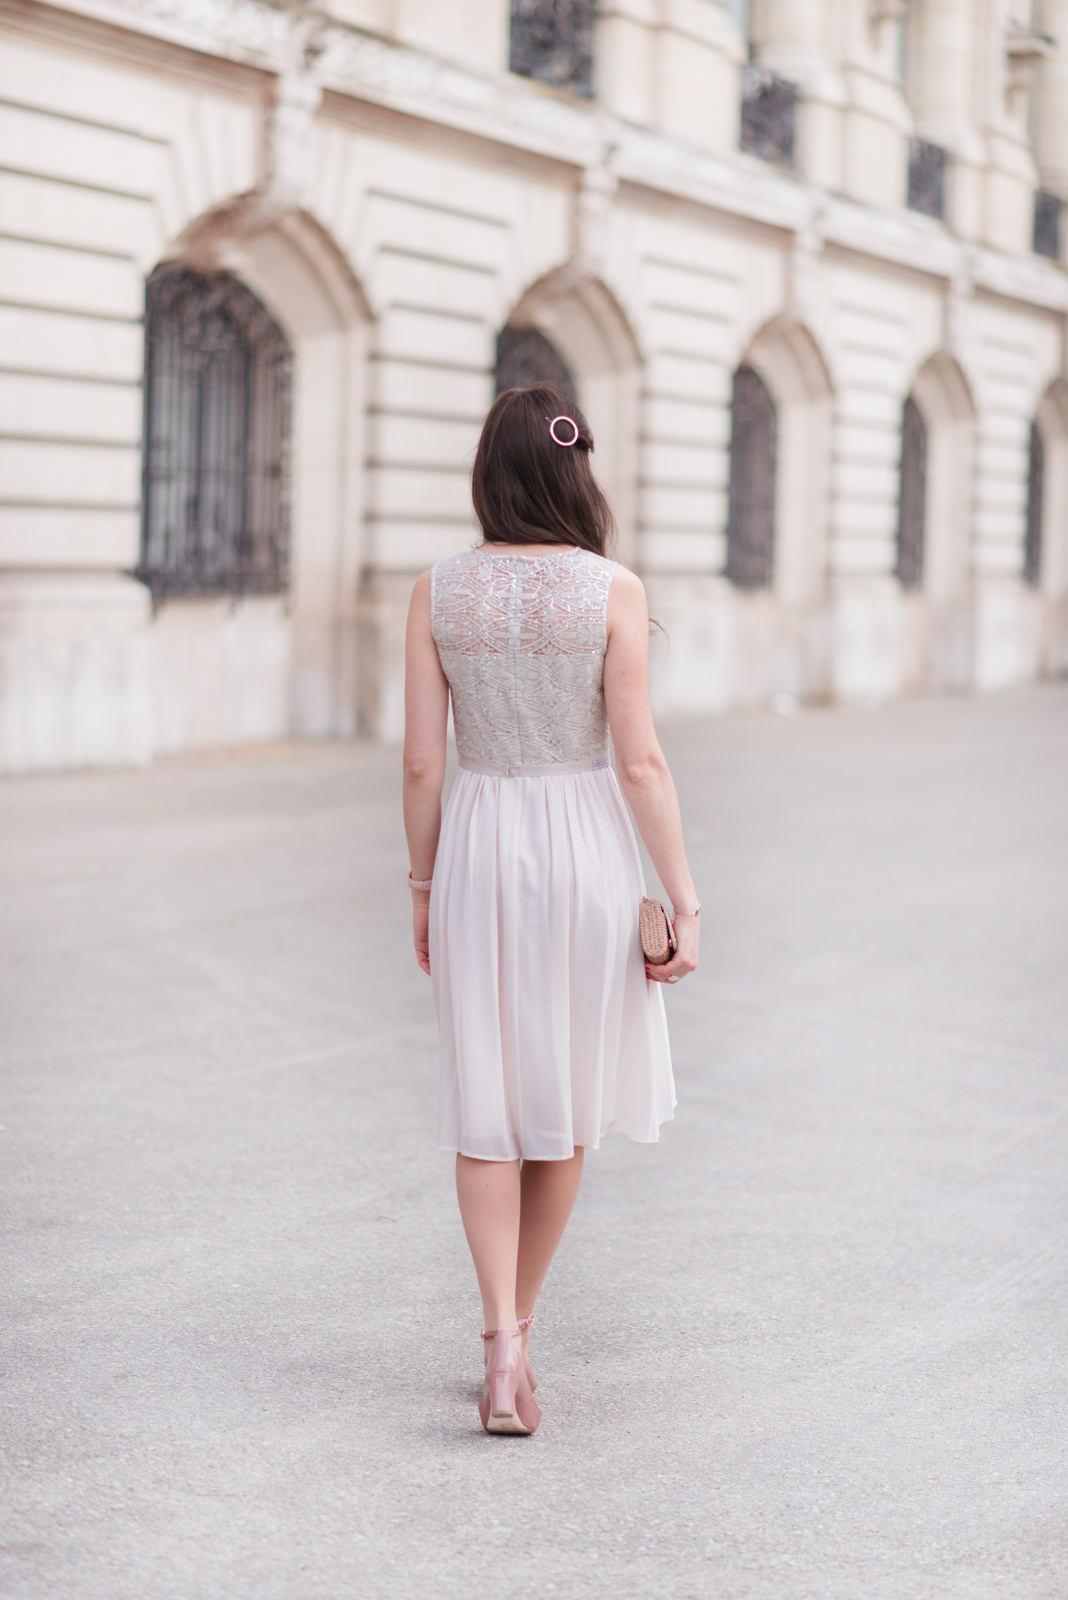 Blog-Mode-And-The-City-Looks-Tenue-Fetes-1-2-3-paris-4